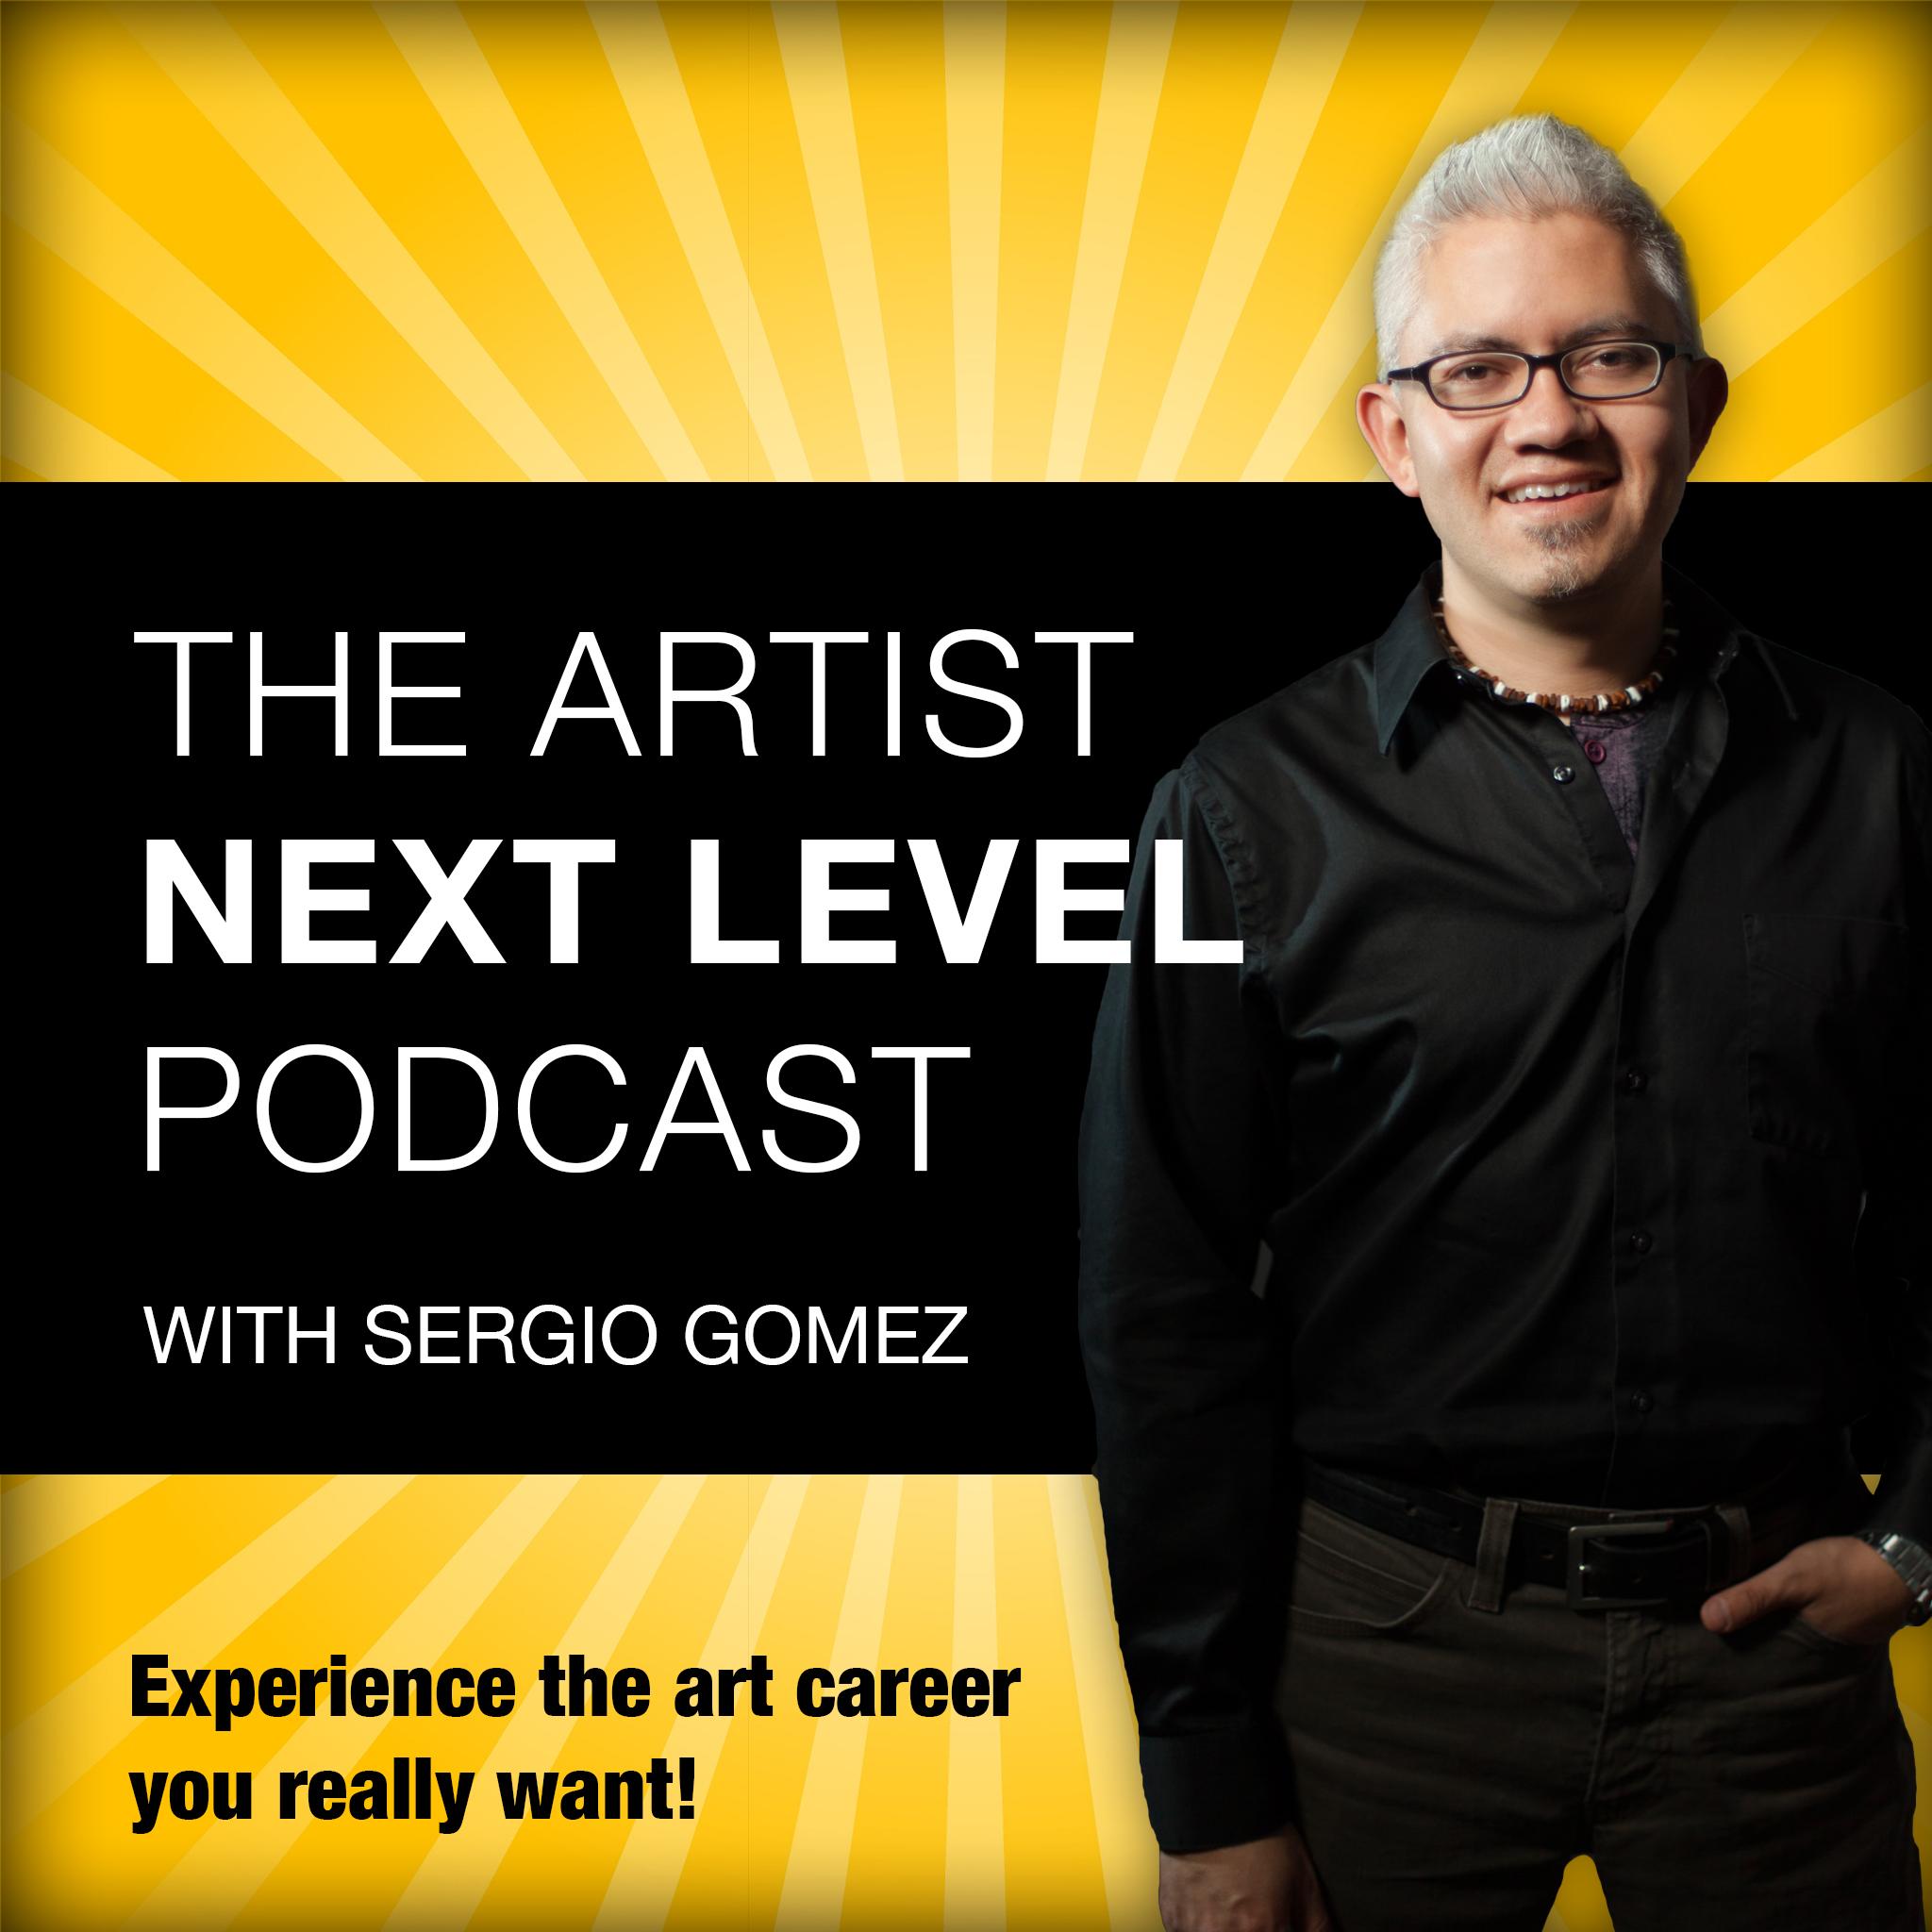 The Artist Next Level with Sergio Gomez  show art